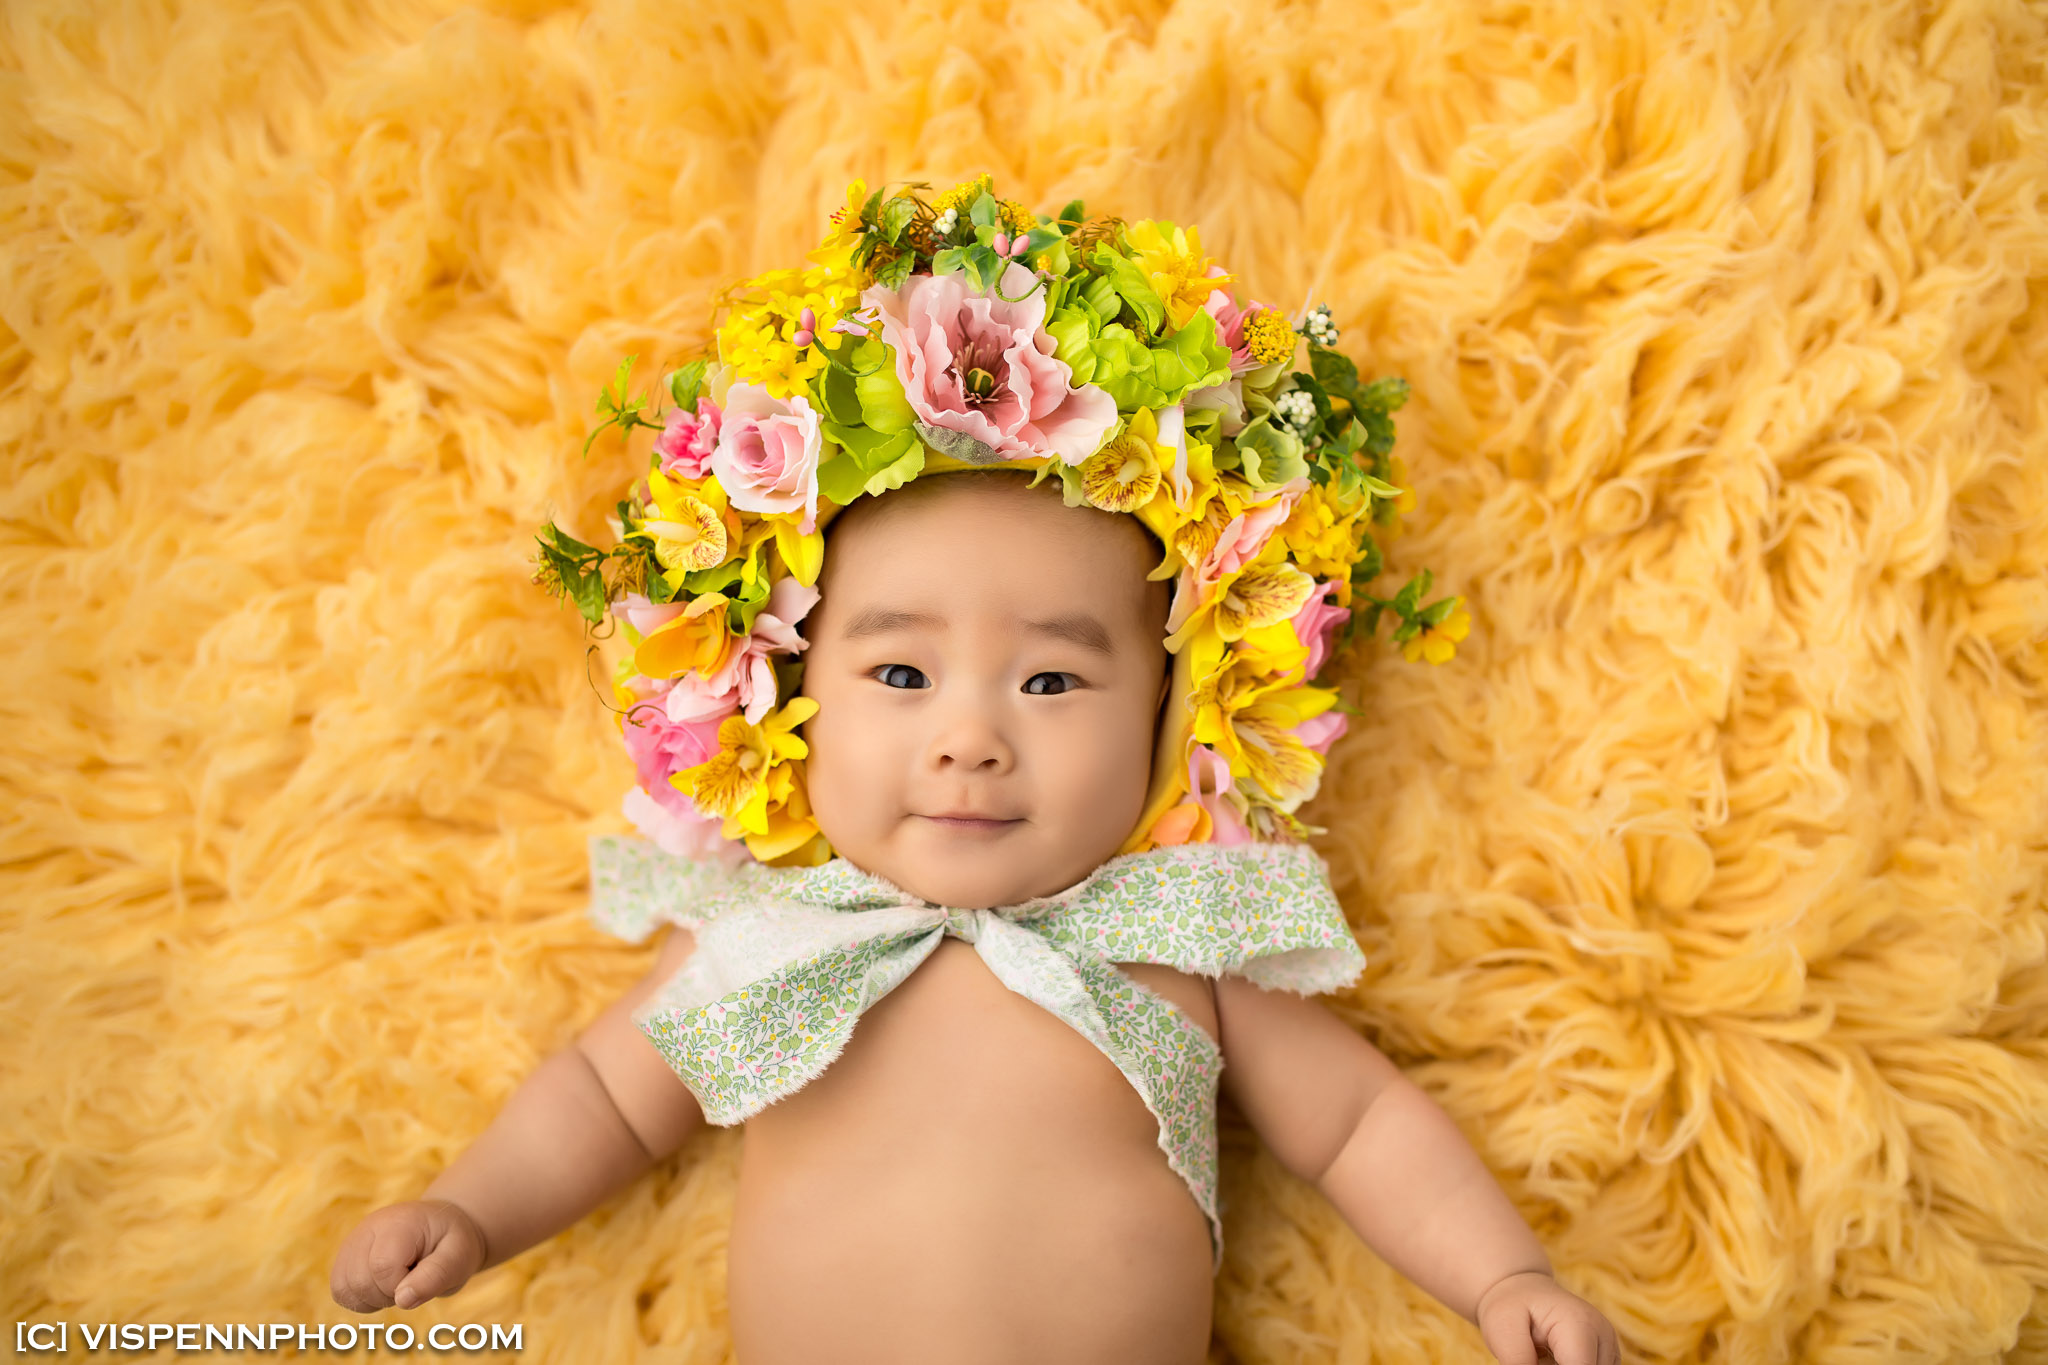 Melbourne Newborn Baby Family Photo BaoBao VISPENN 墨尔本 儿童 宝宝 百天照 满月照 孕妇照 全家福 100DAYS VISPENN SherryXiangLI 0317